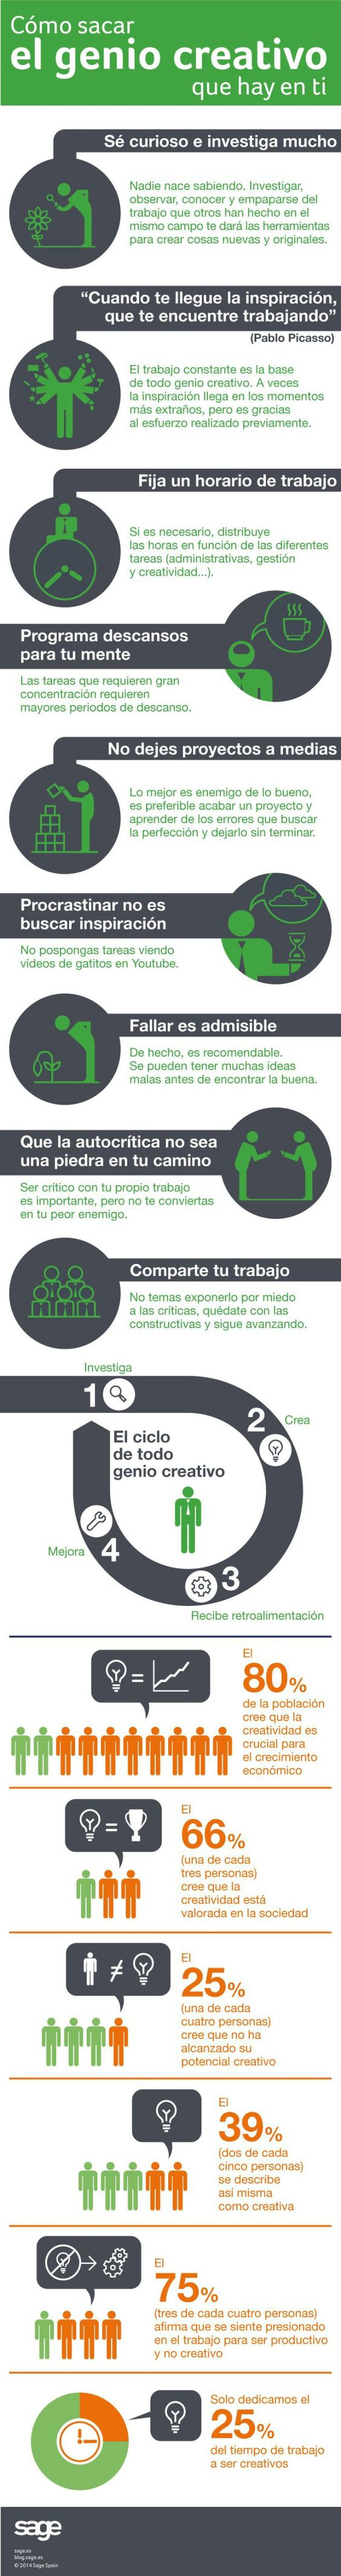 GenioCreativoDescubreMejorTi-Infografía-BlogGesvin